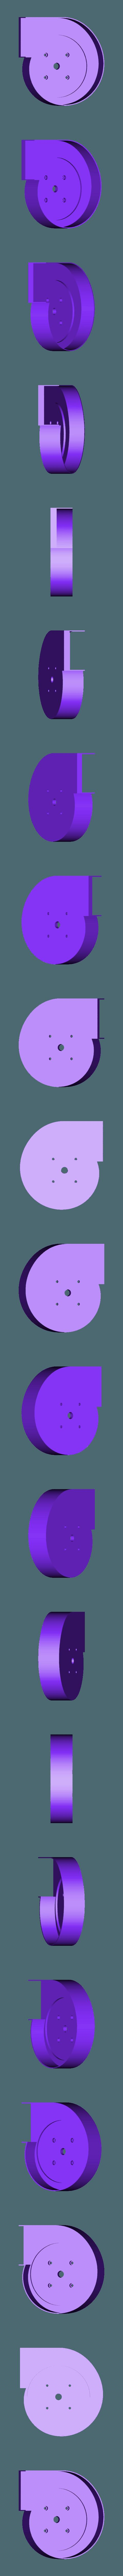 Part-Teil 02 Fan housing - Gehaeuse.stl Download free STL file BBQ Fan Extension for Gearbox 256 / Grillgebläse Erweiterung für Getriebe 256 • 3D print design, CONSTRUCTeR